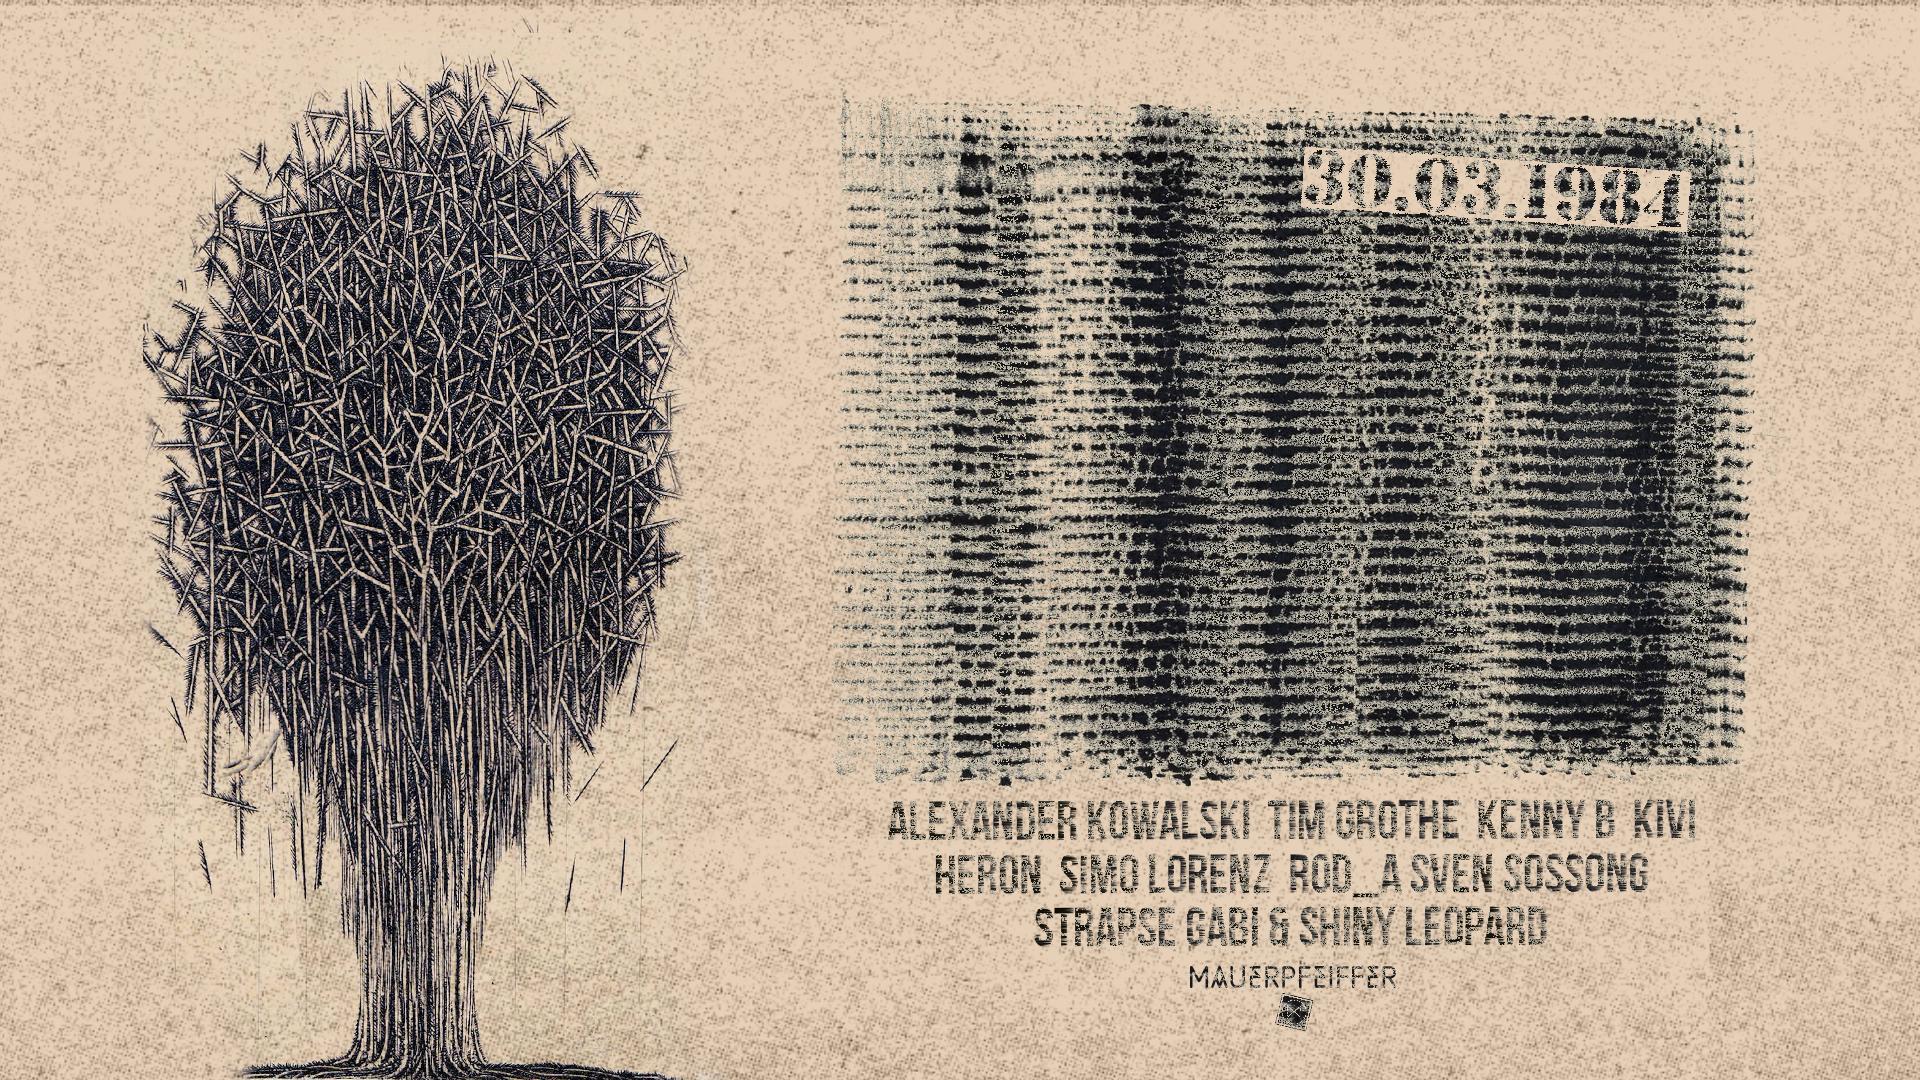 300384 - Alexander Kowalski live!, Simo Lorenz, Heron uvm.